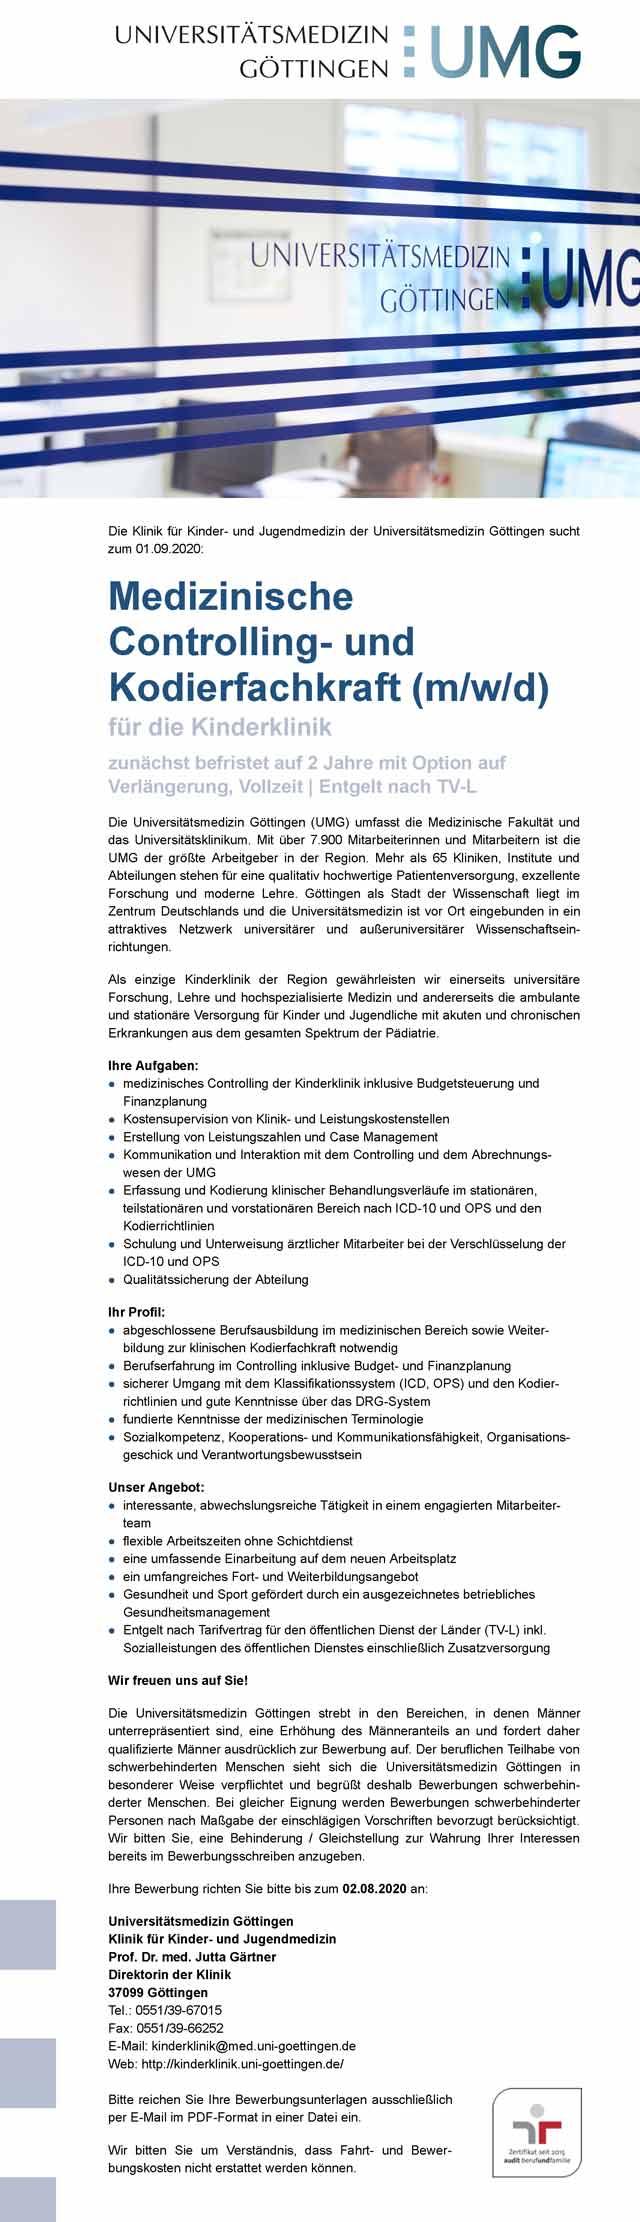 Universitätsmedizin Göttingen: Med. Controlling- und Kodierfachkraft (m/w/d)